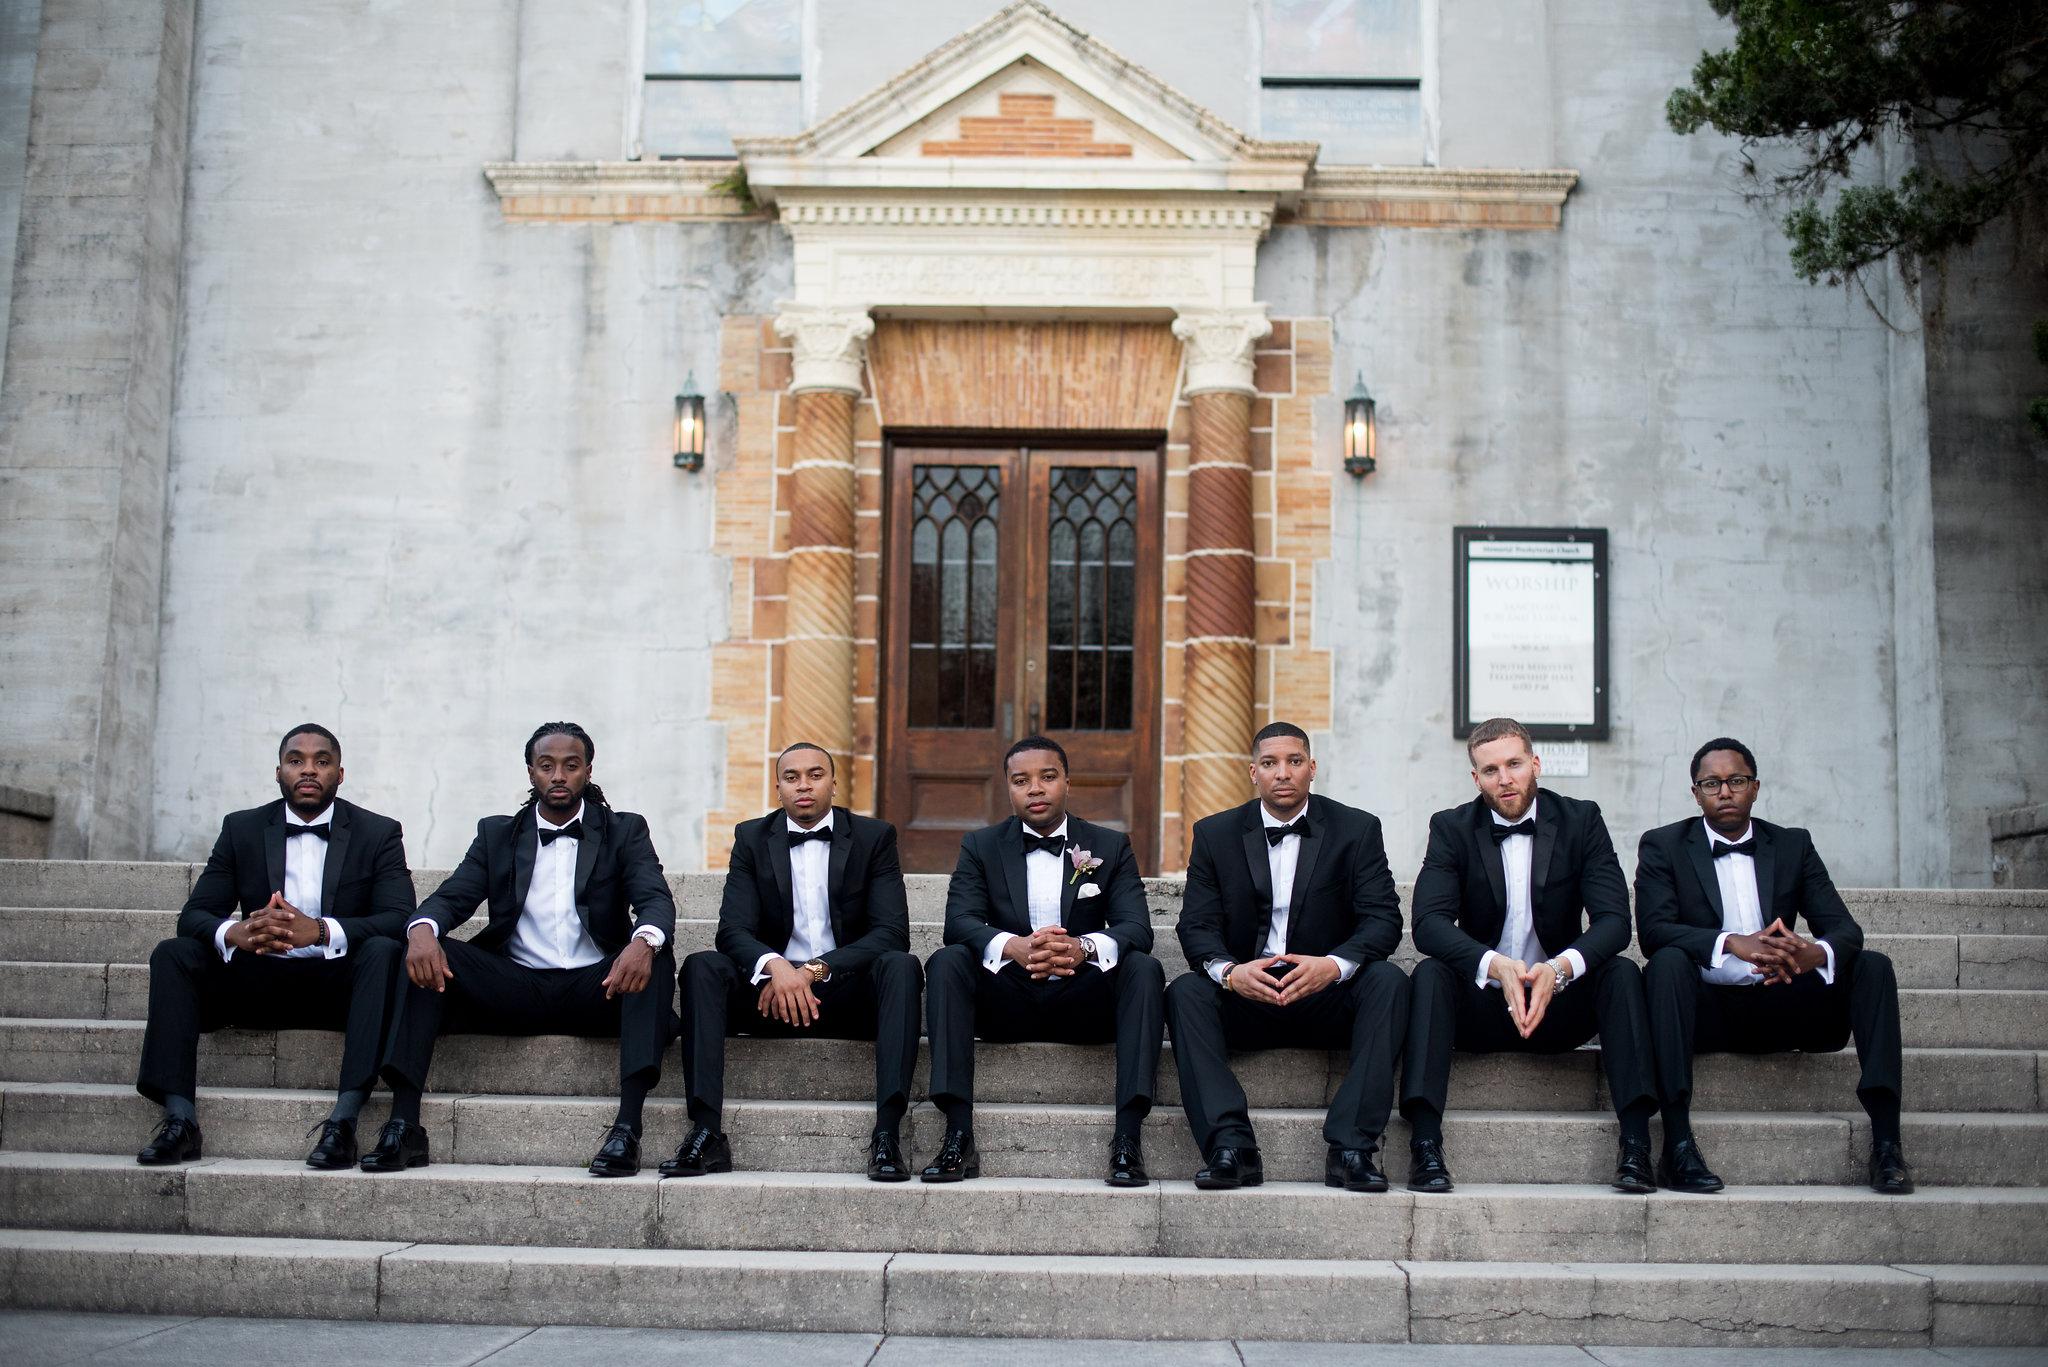 st-augustine-wedding-photographer-sarah-annay-photography.jpg5.jpg